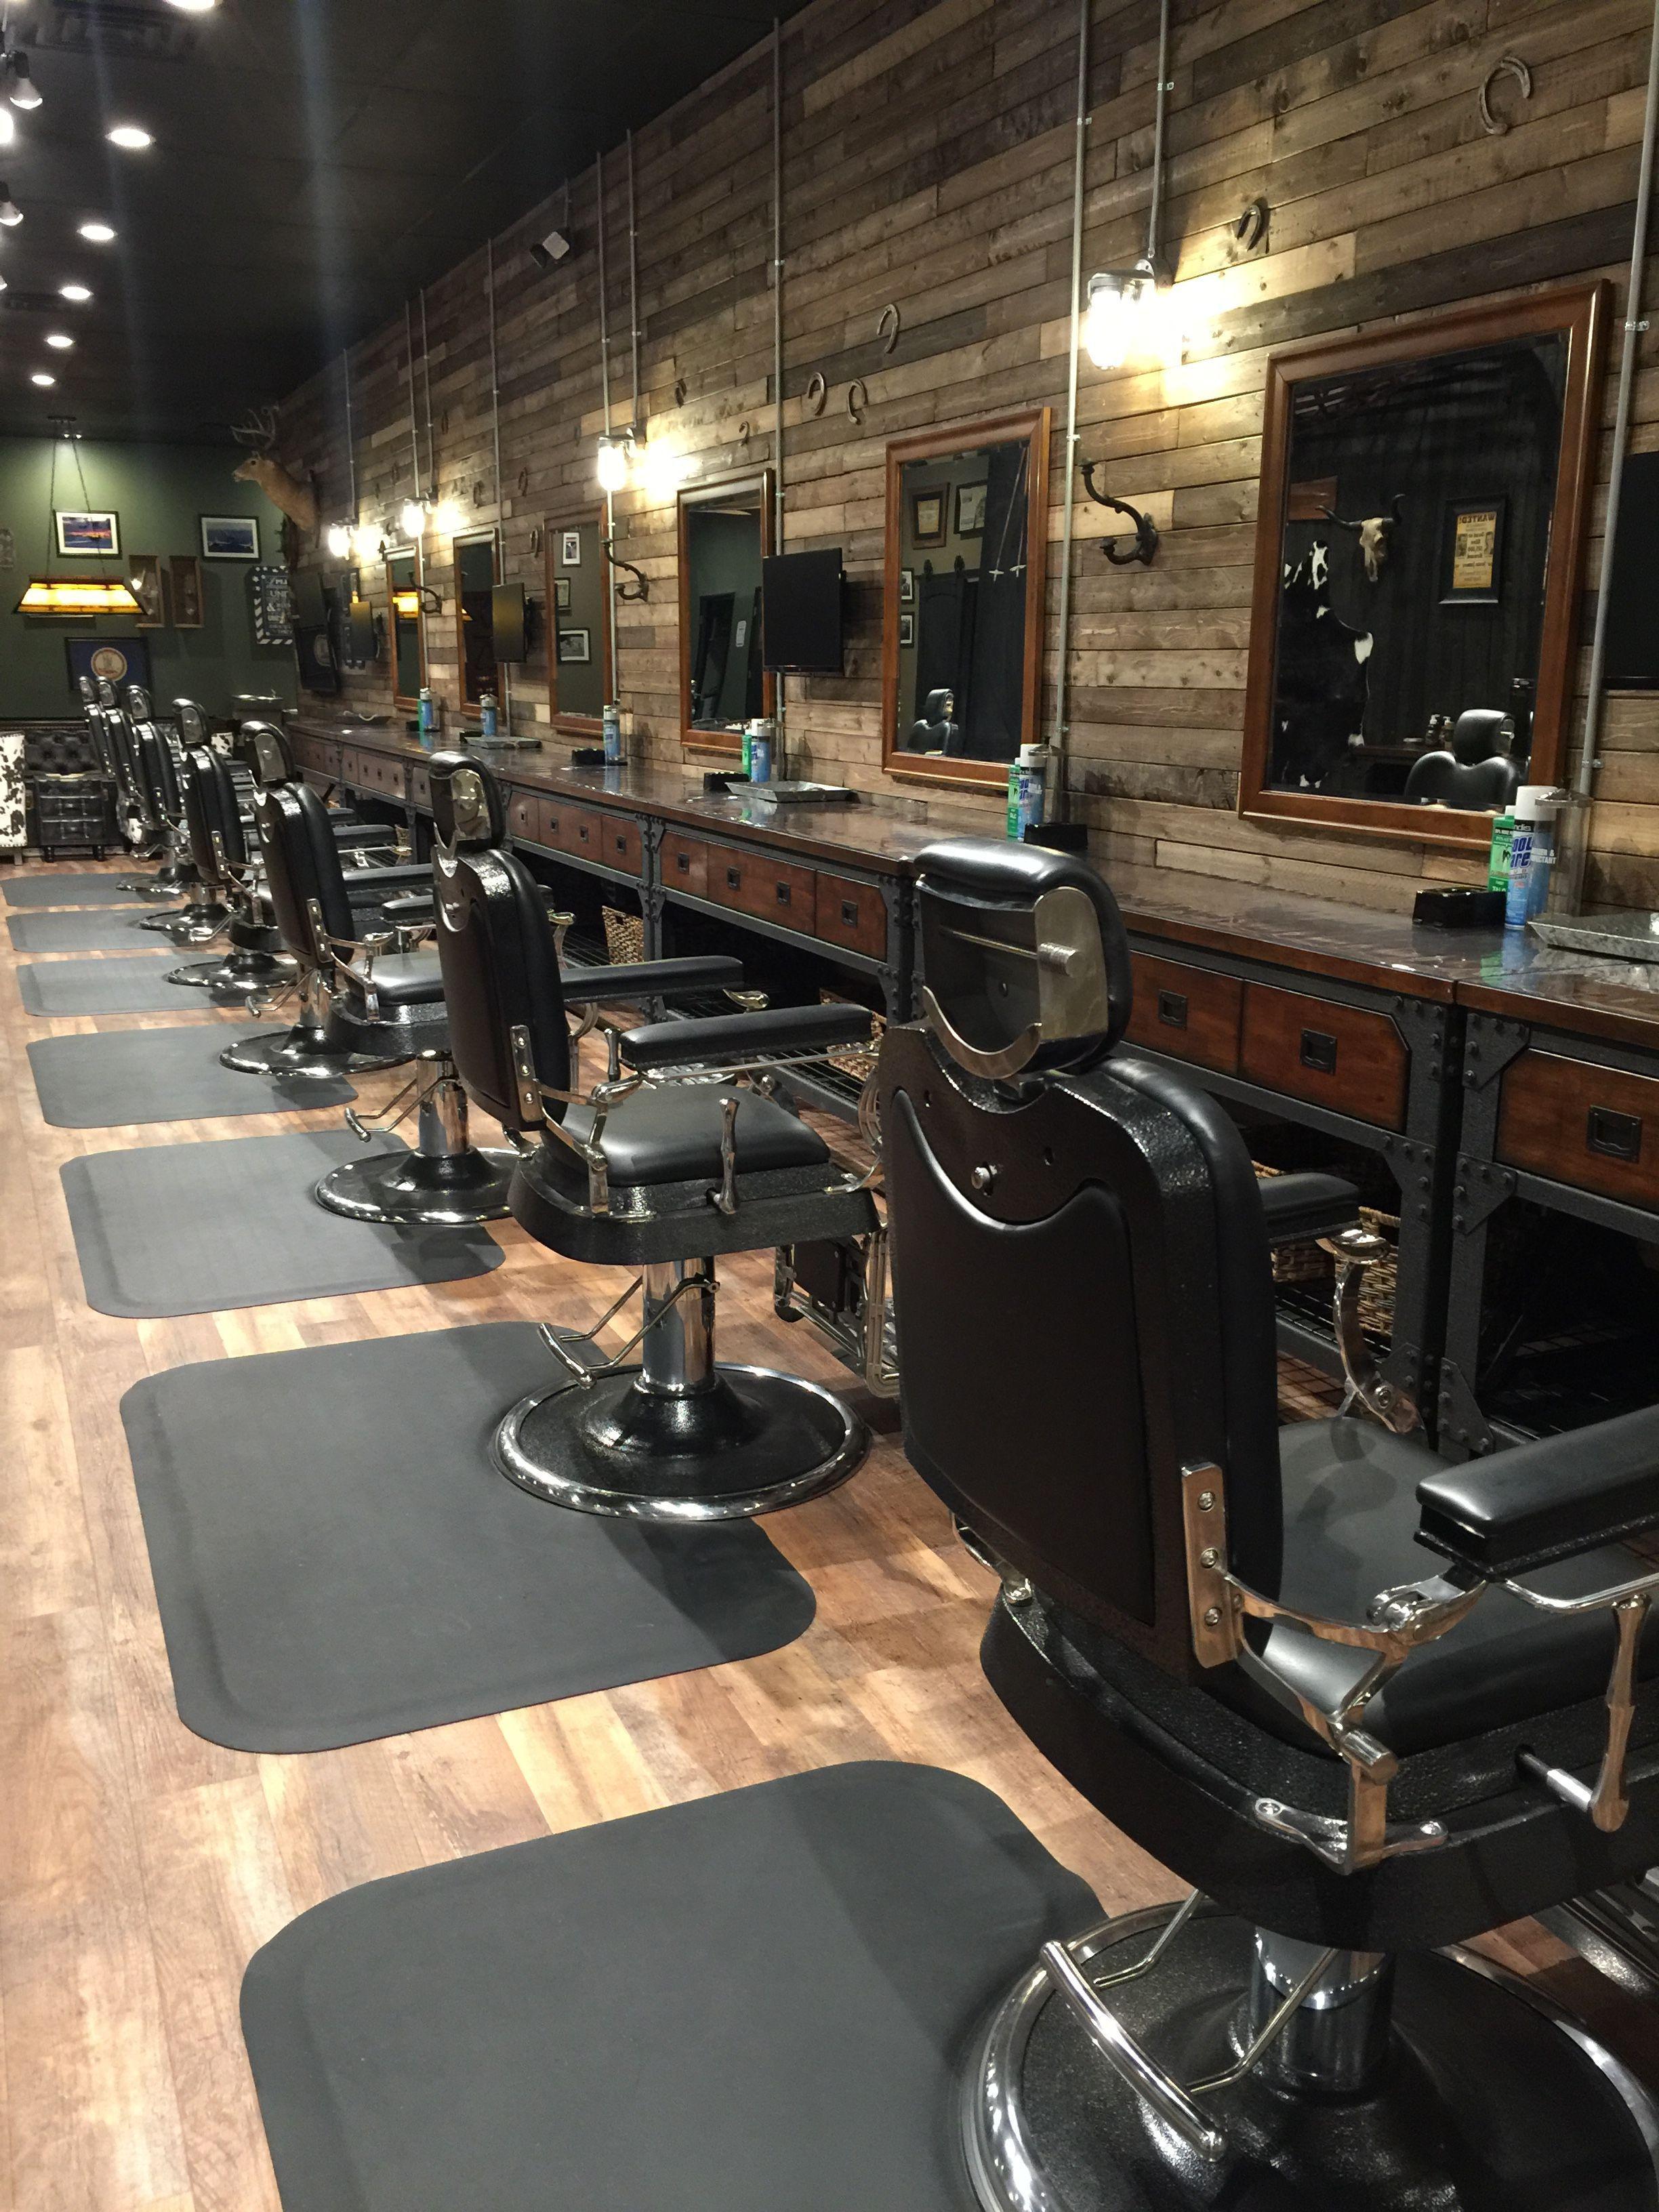 Barber Shop Home Barber Shop Decor Barber Shop Interior Barber